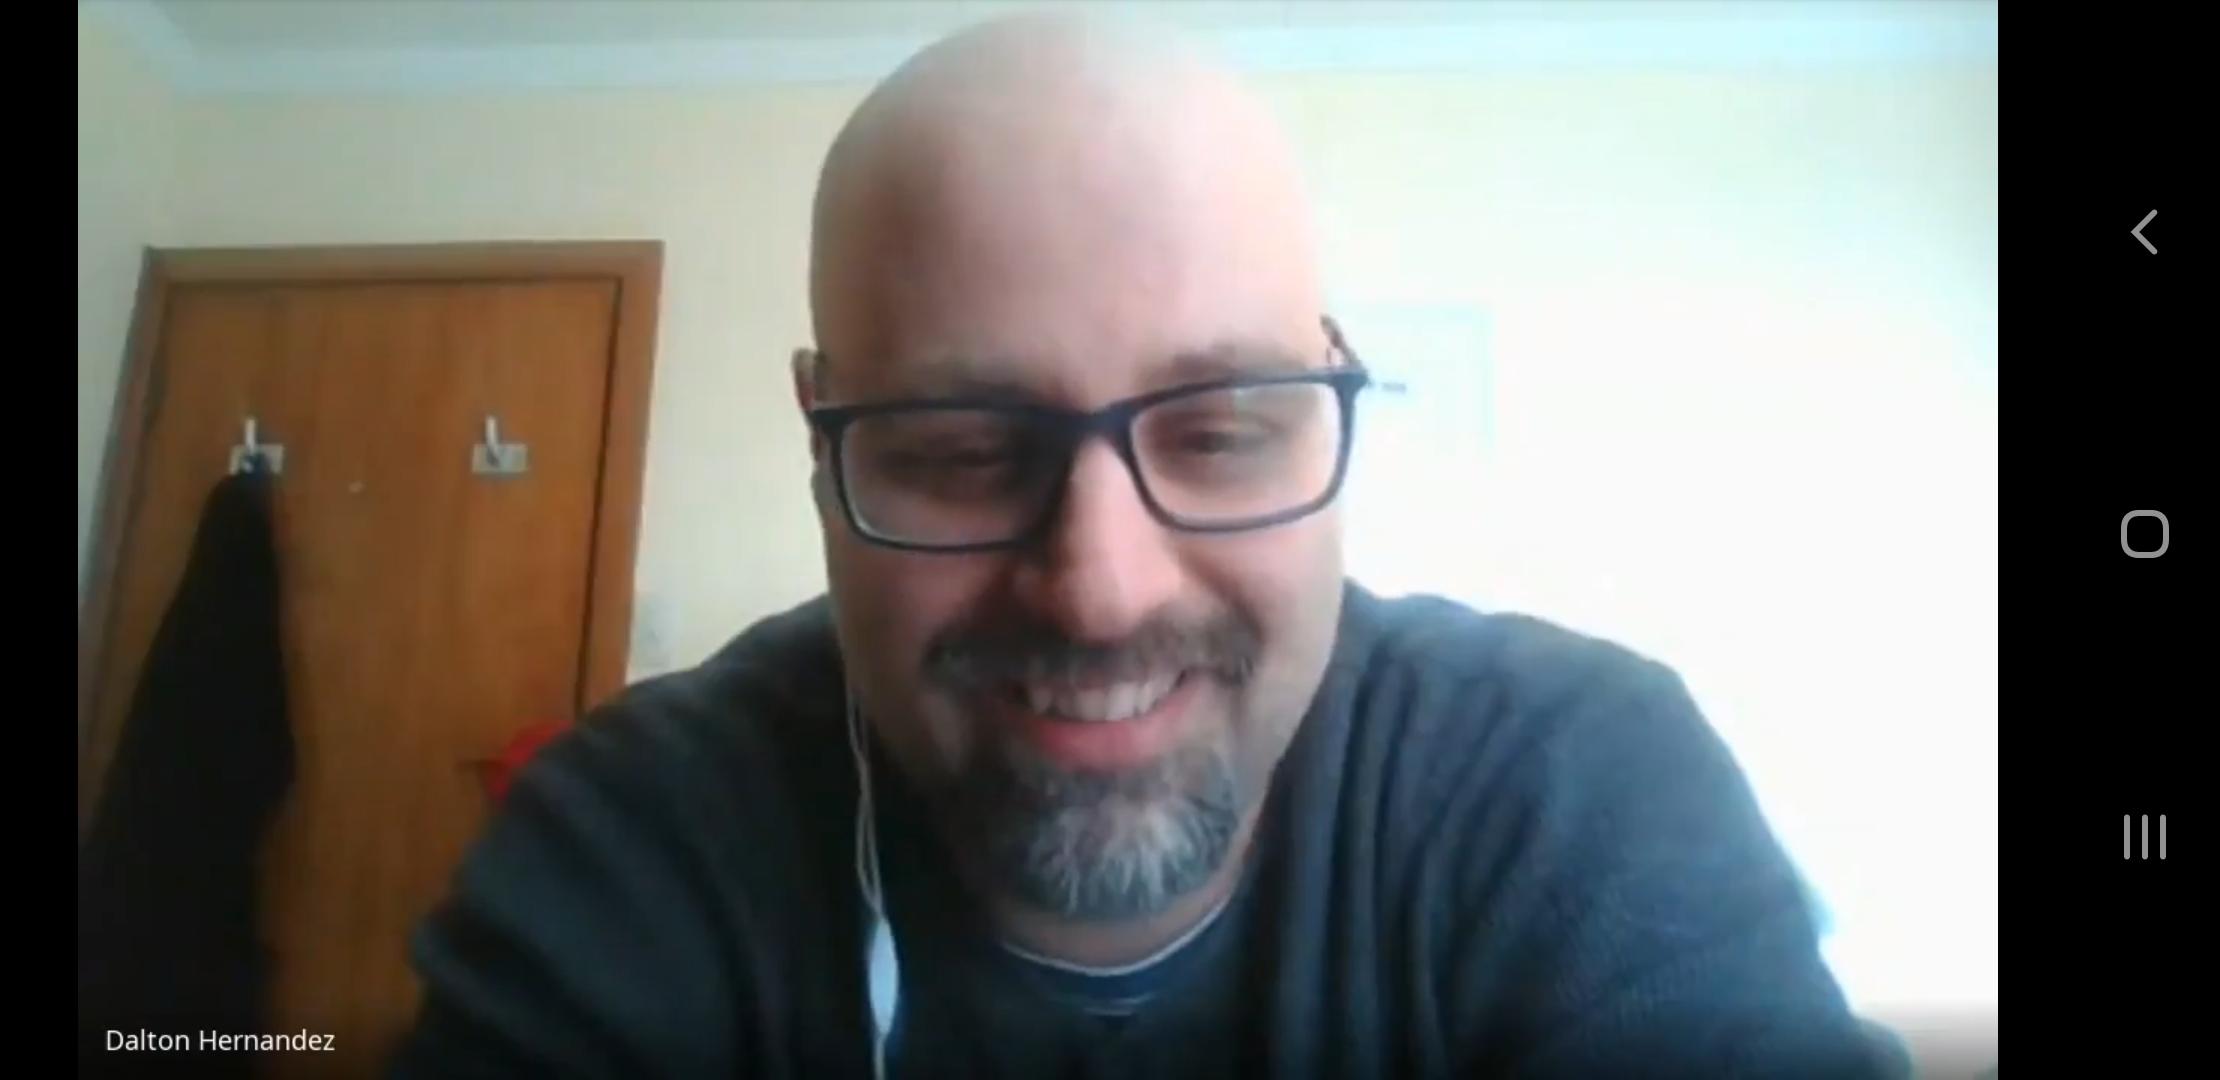 Brasileiros pelo mundo da pandemia – Dalton Chiarioni na Nova Zelândia